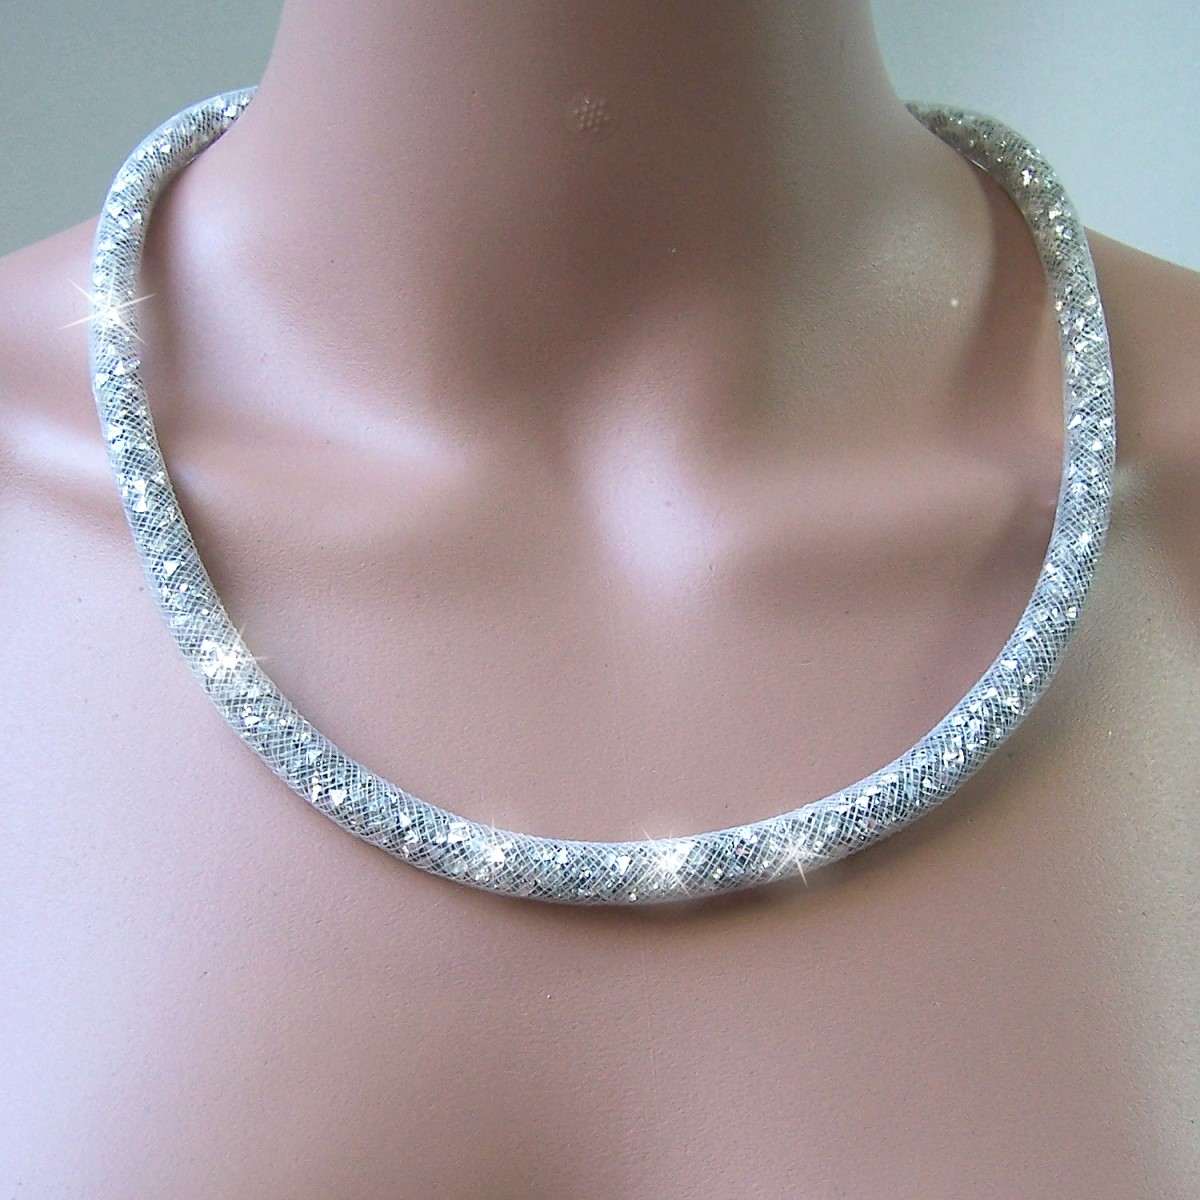 K2622# Collier 58cm lang Strasskristalle silber in 3D-Netzschlauch